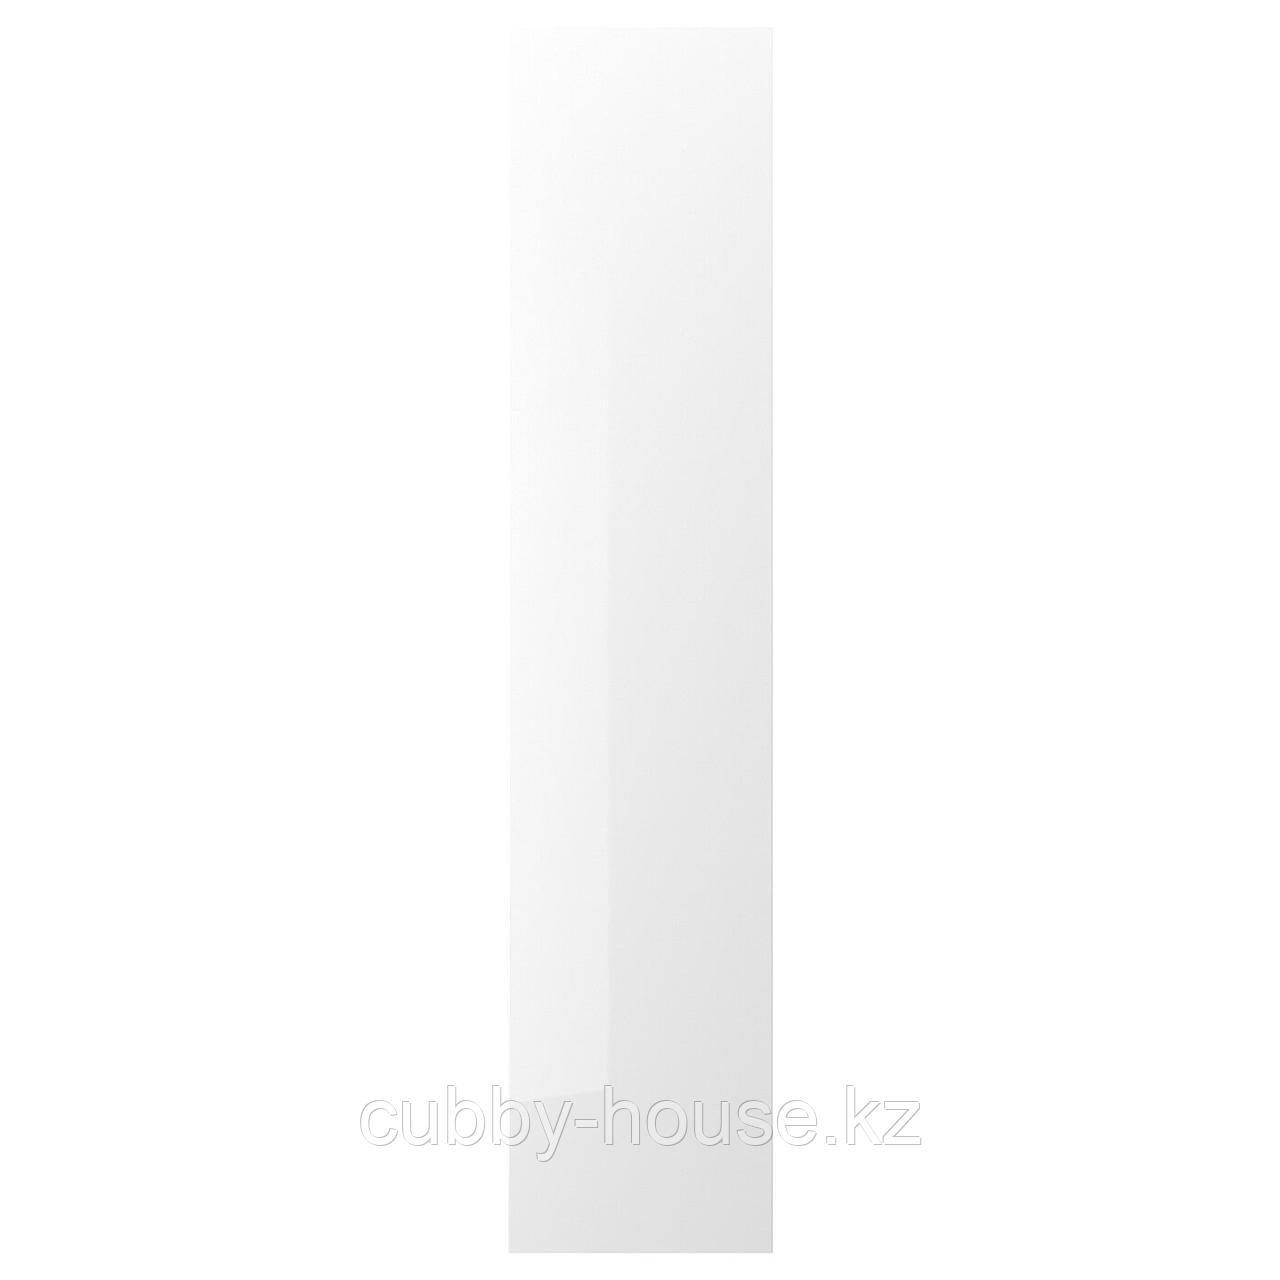 ФАРДАЛЬ Дверь, глянцевый белый, 50x195 см